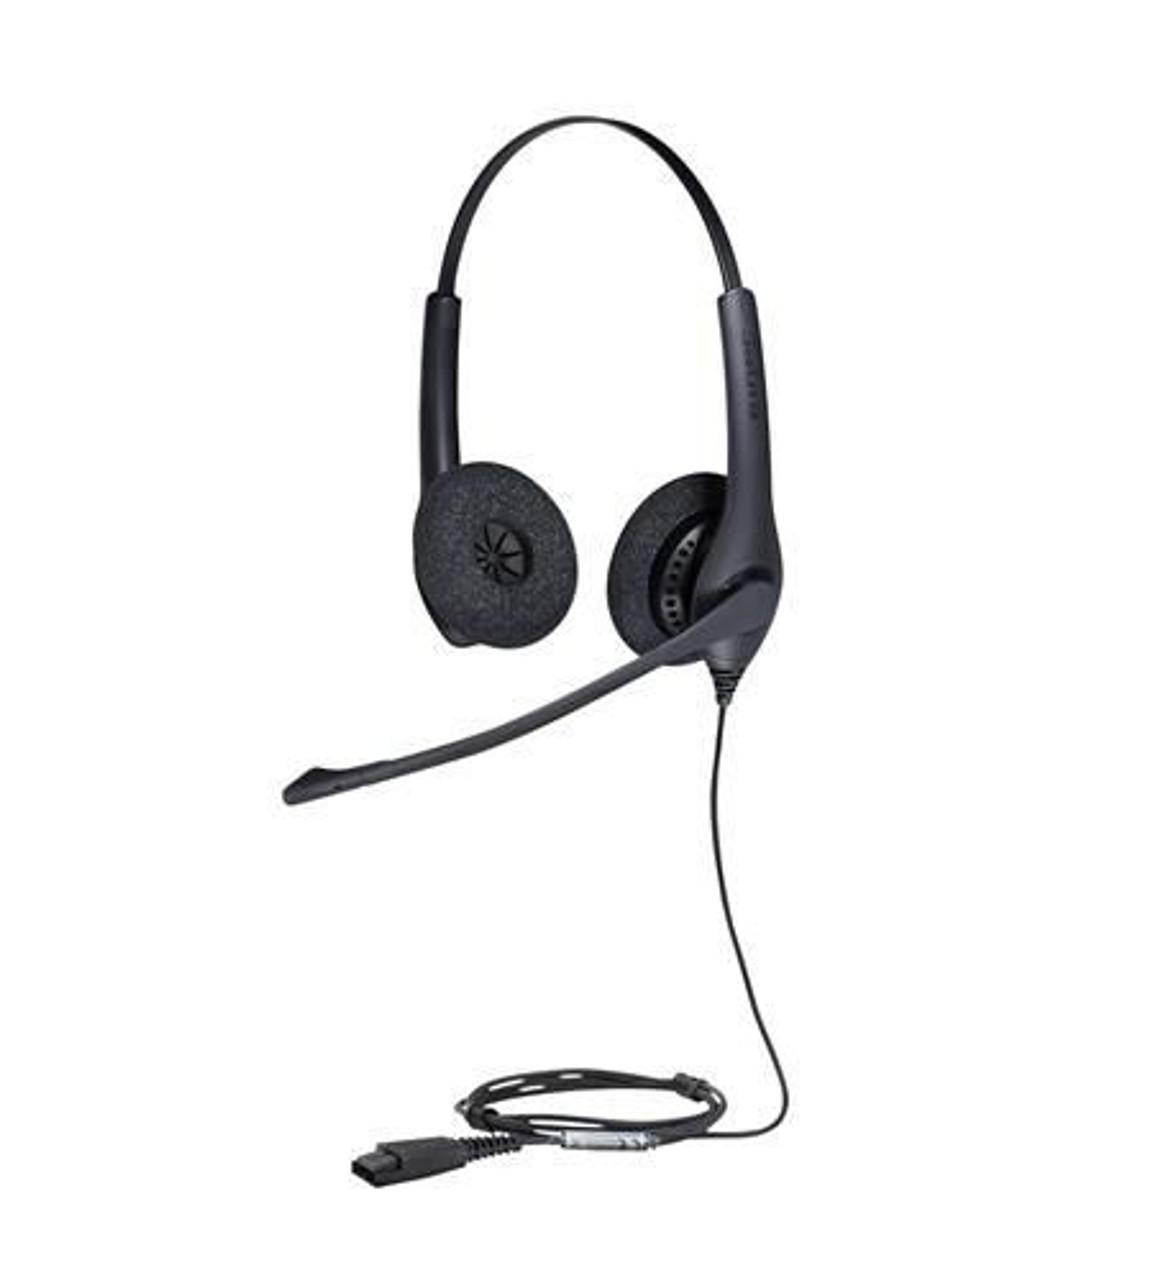 NEW Jabra Biz 1500 1513-0157 QD Mono Headset